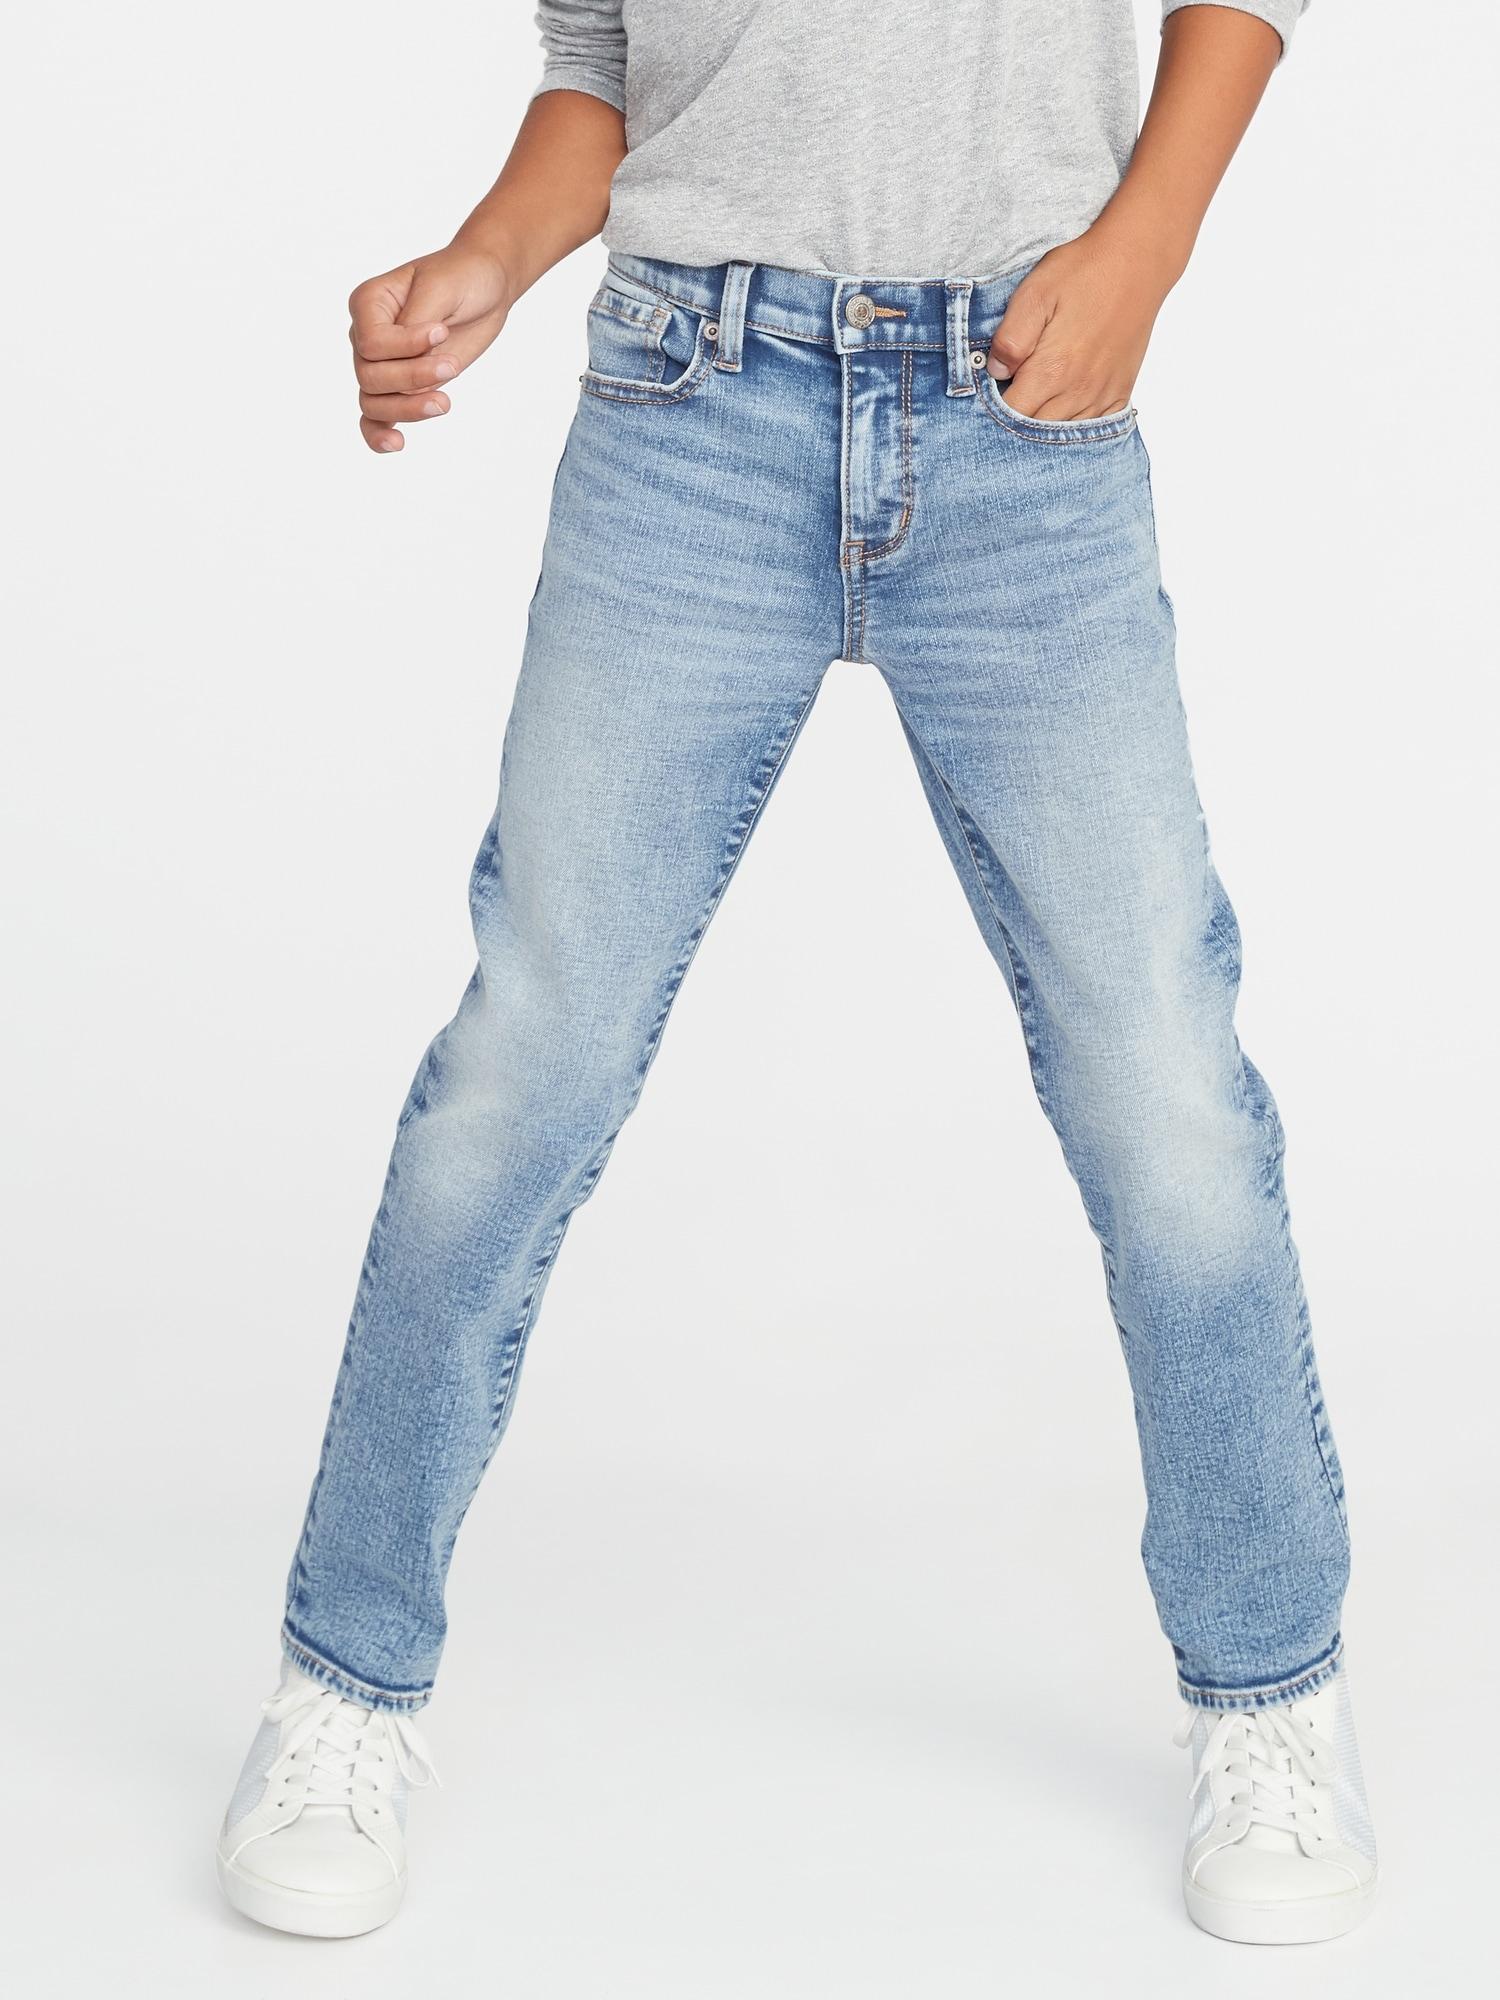 ee16891f070 Karate Slim Built-In Flex Max Jeans for Boys